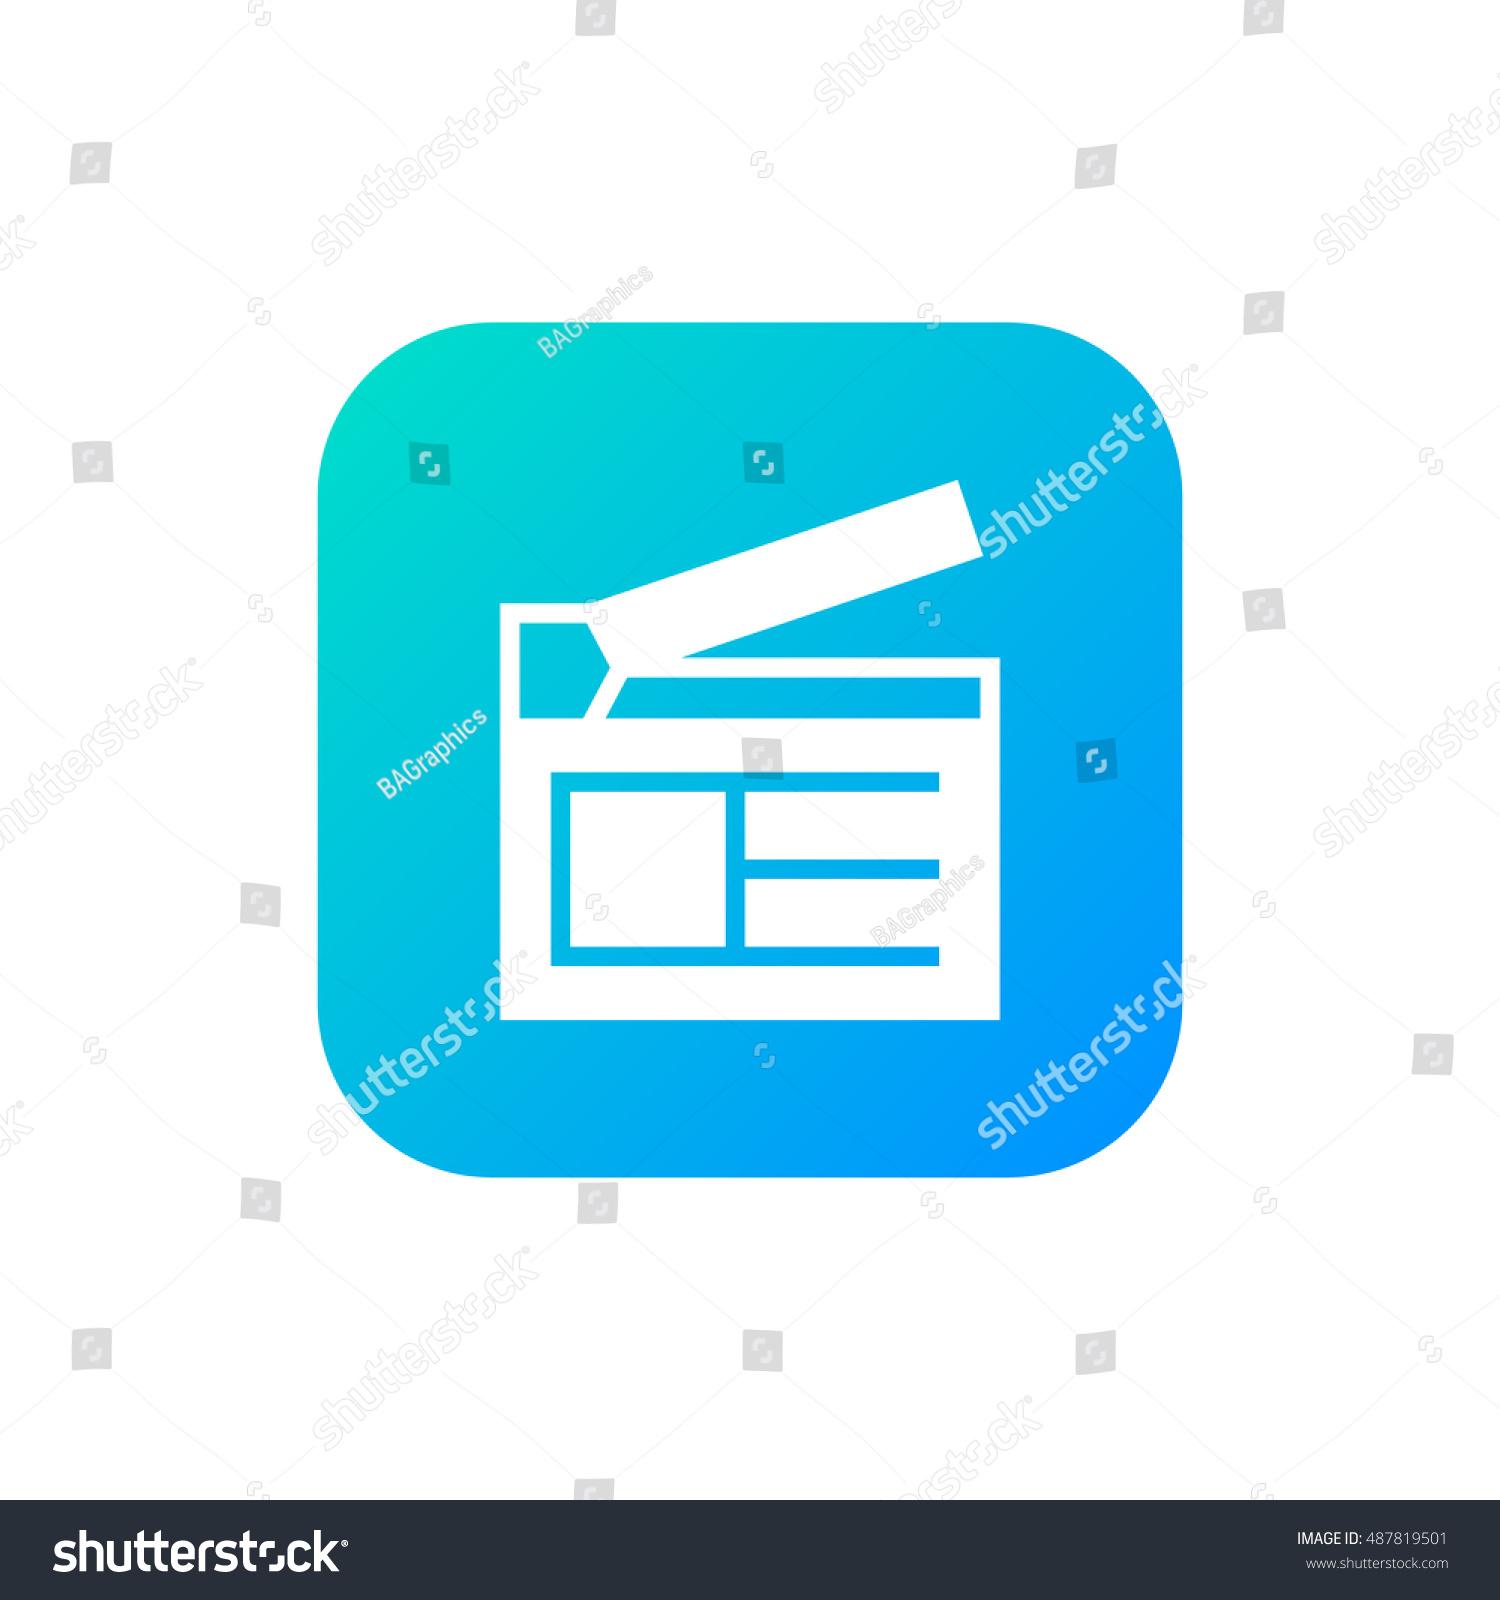 clapperboard icon vector clip art useful stock vector 2018 rh shutterstock com Thanks Clip Art Wizard Clip Art